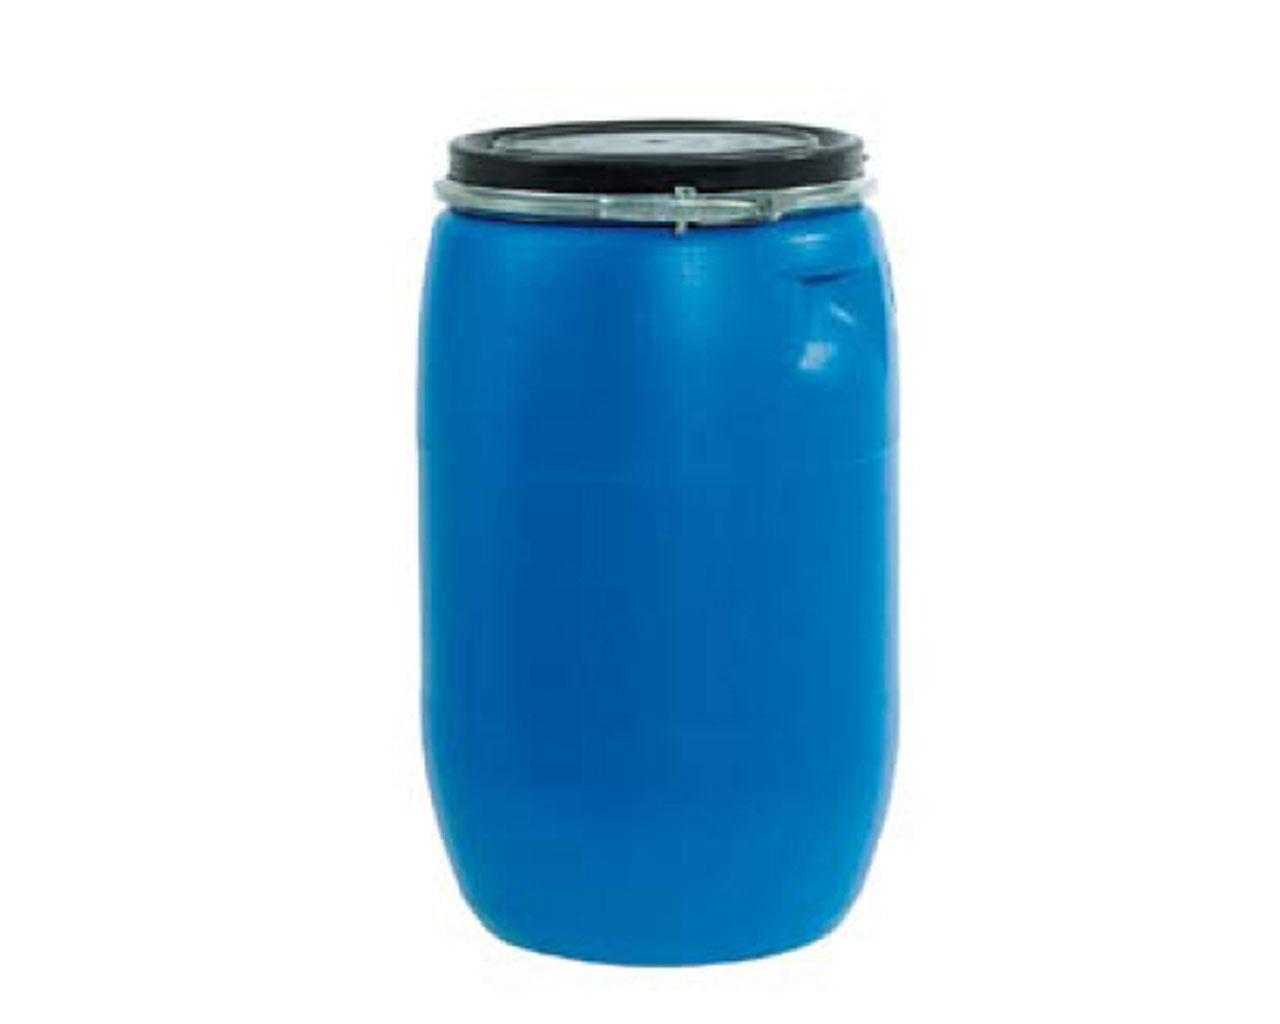 Envases industria cer mica castell n suministros vives for Bidon 30 litros cierre ballesta